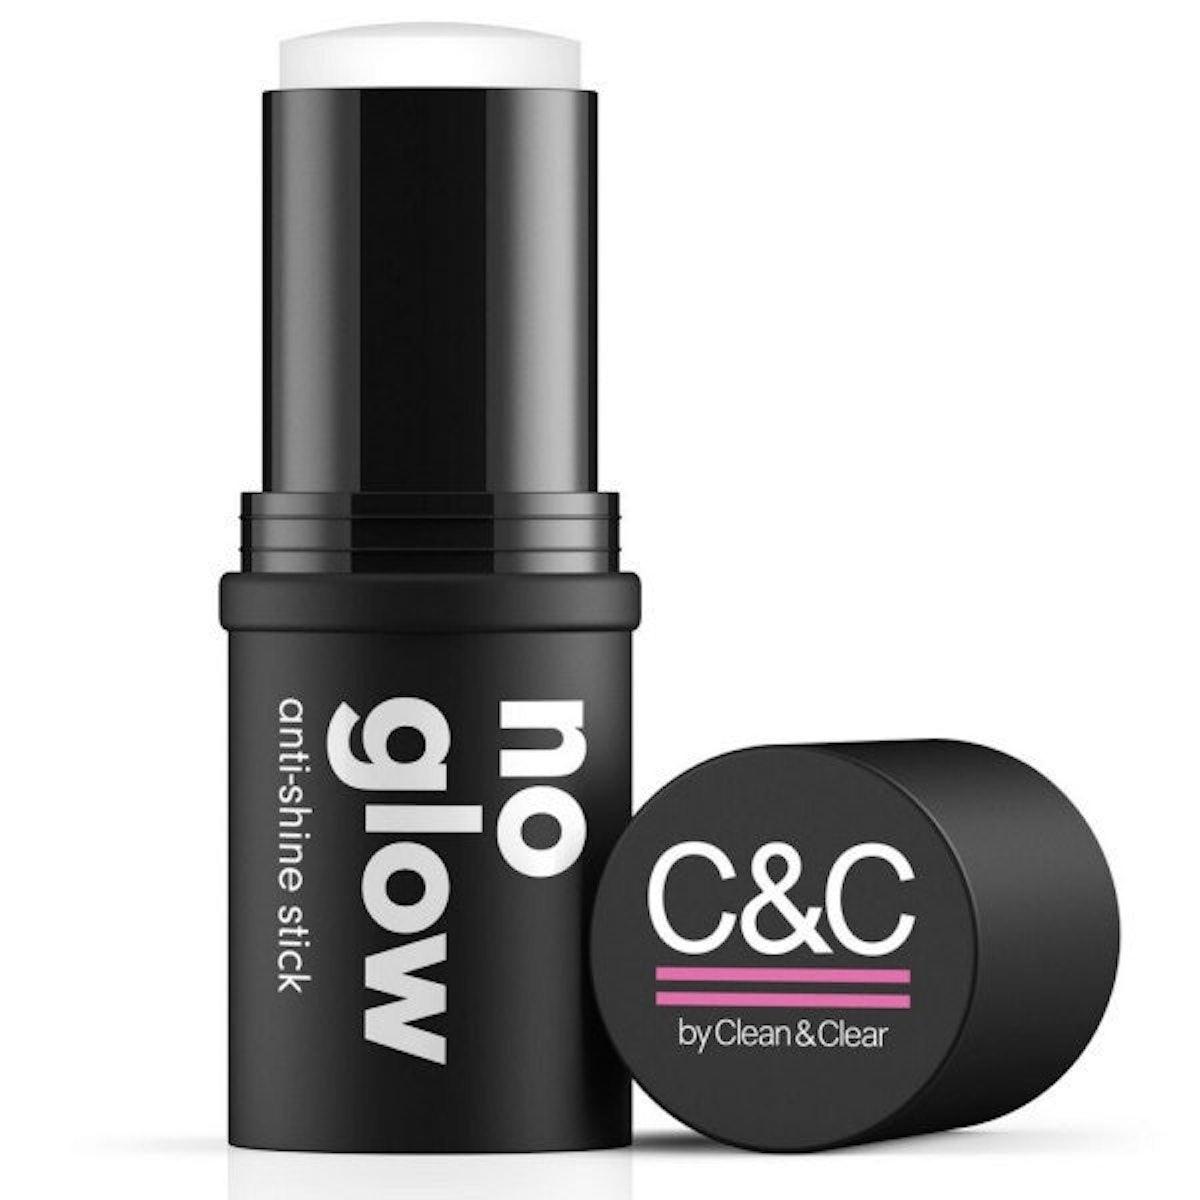 C&C No Glow Anti-Shine Stick